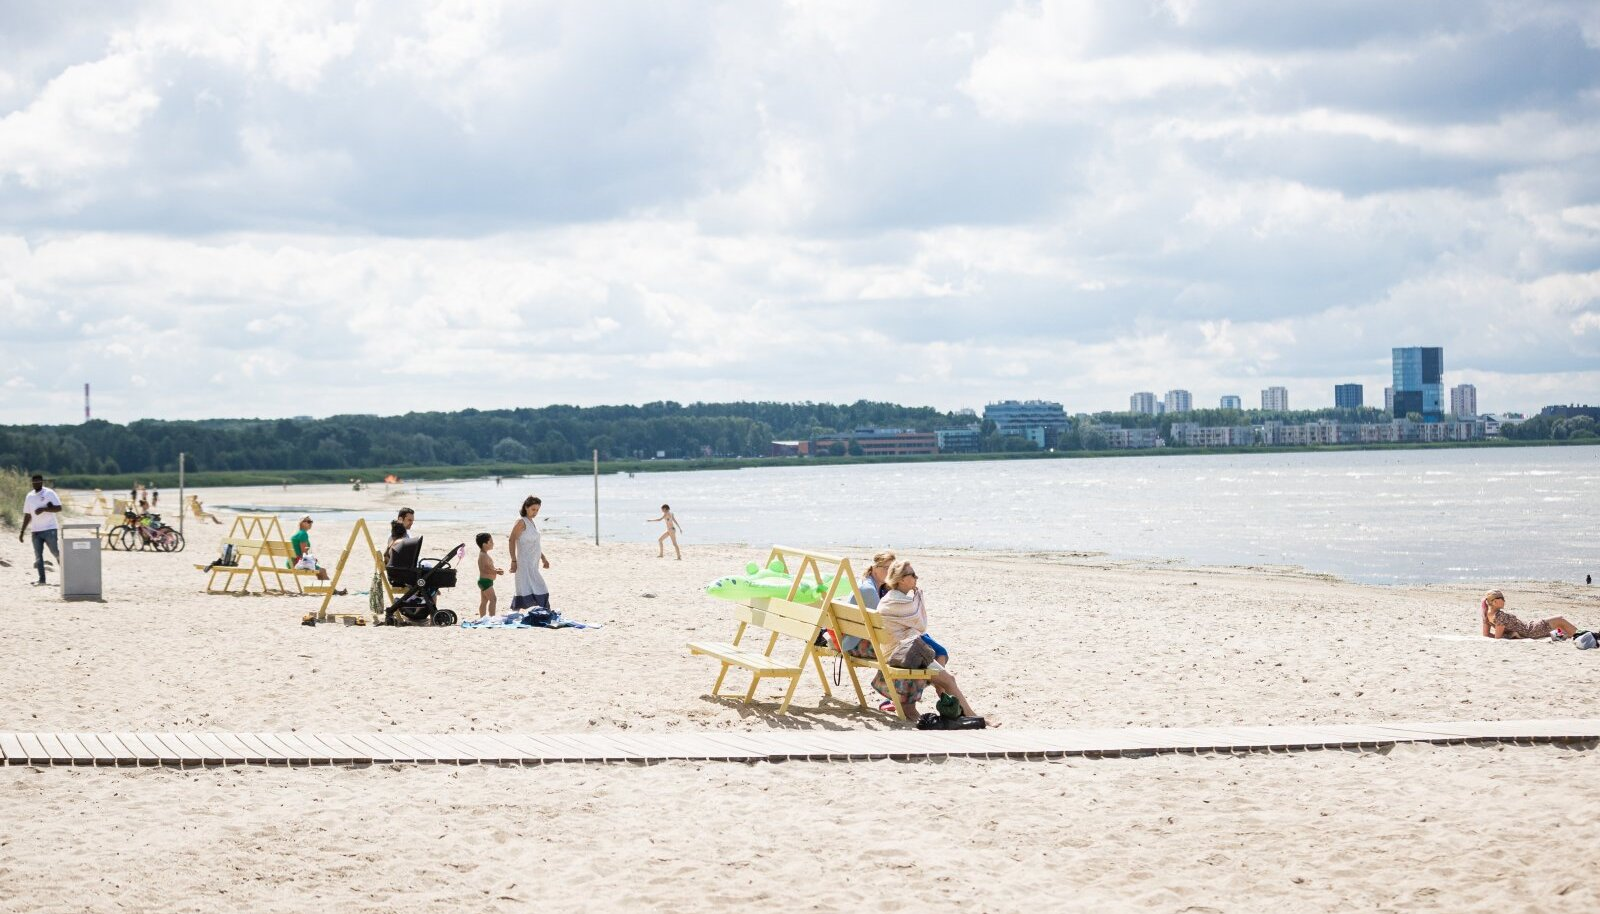 Stroomi rand 26 juunil